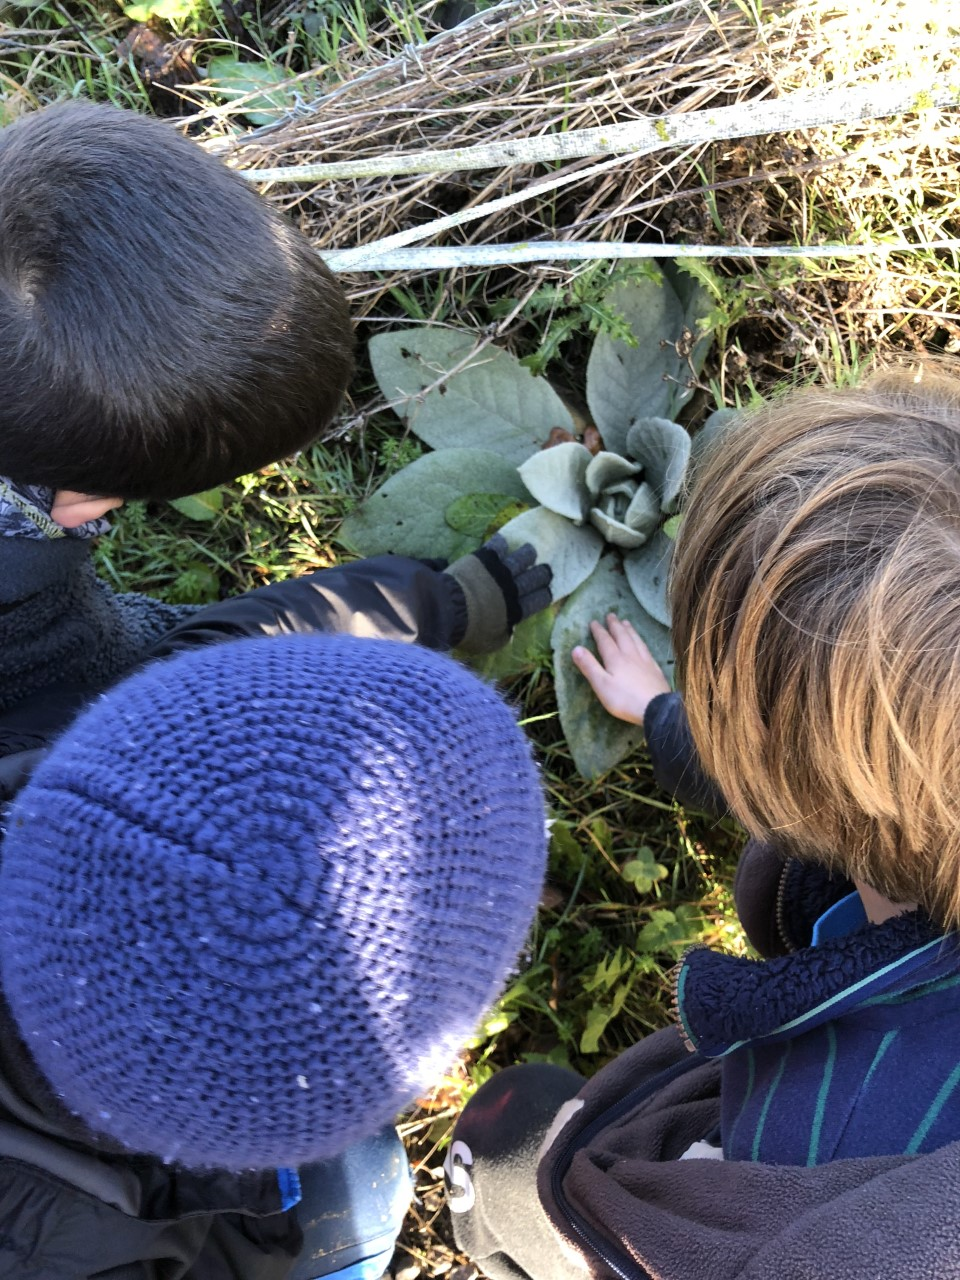 kids touching a plant